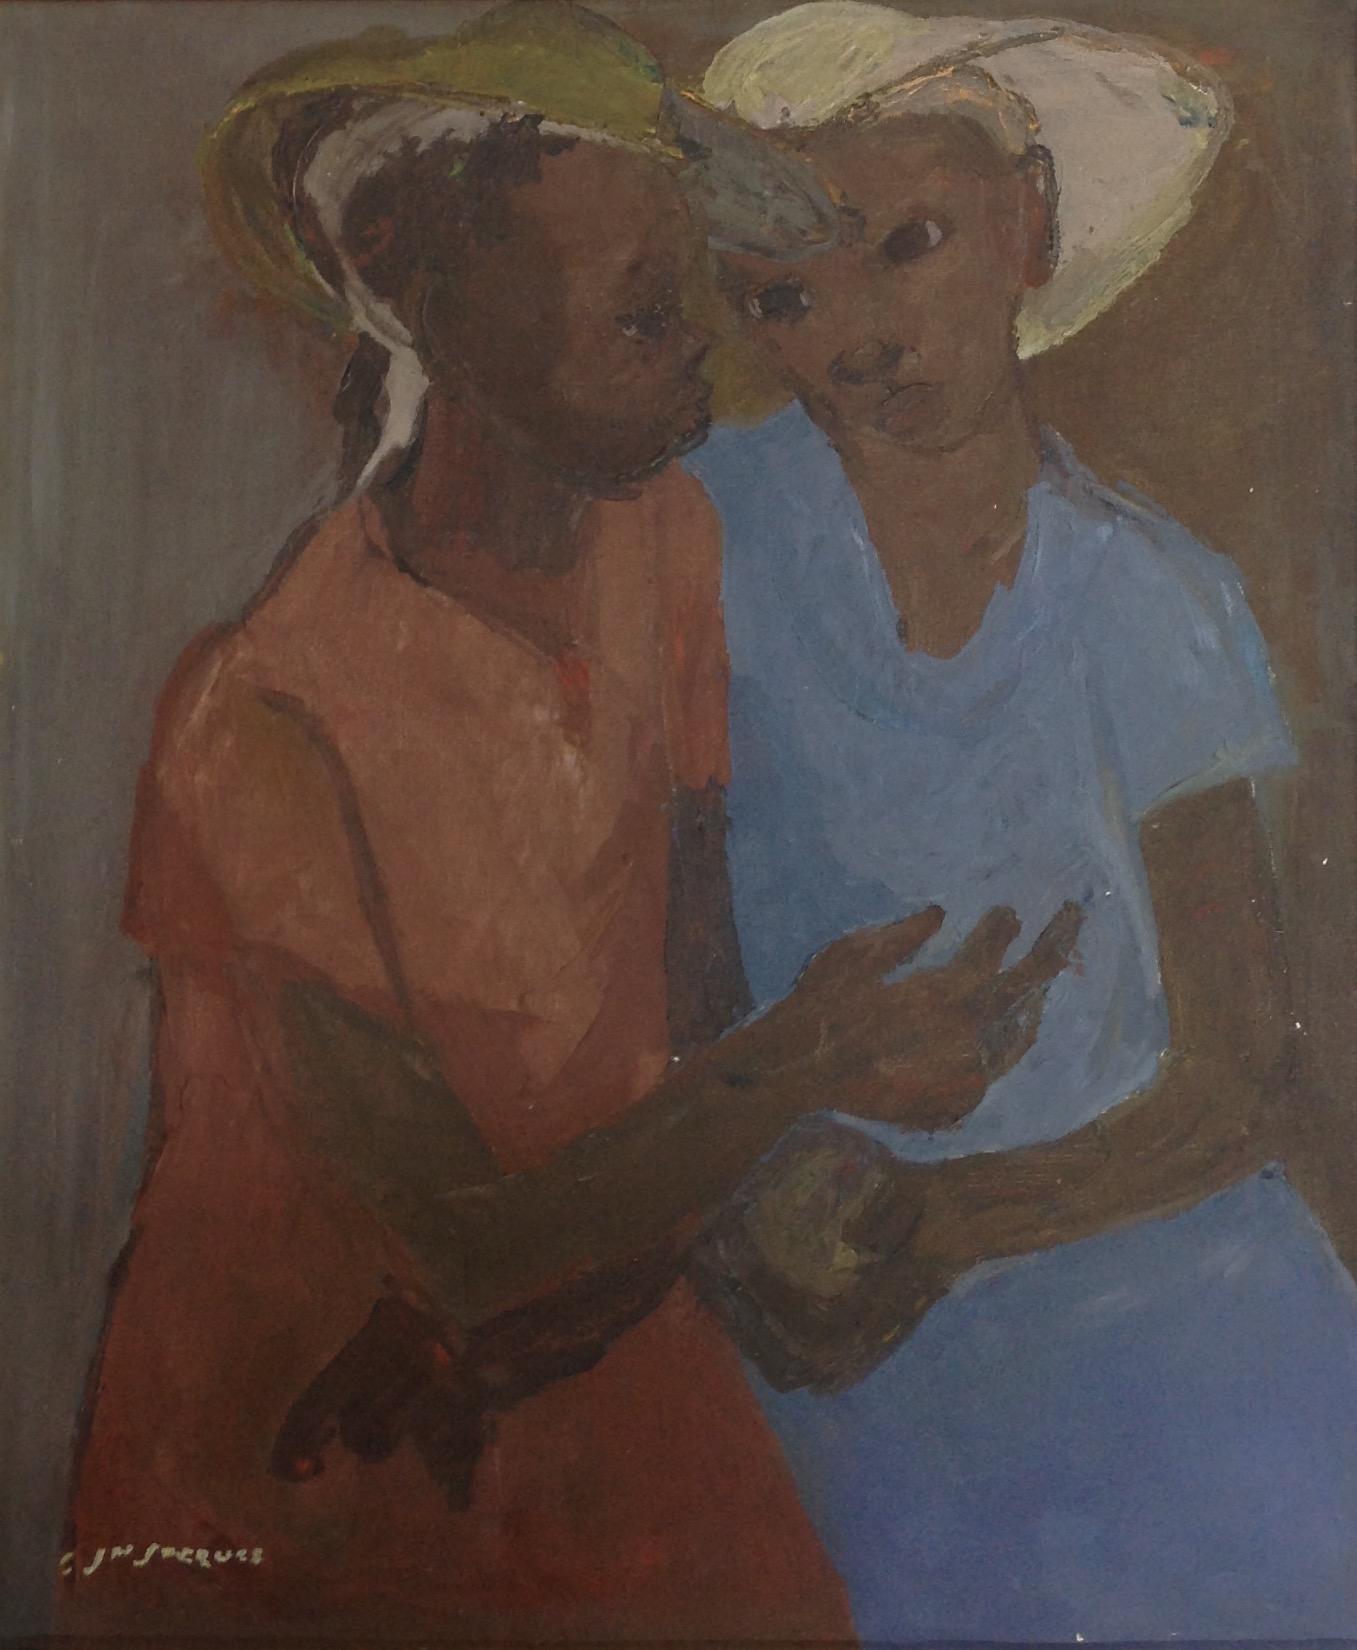 Jn Jacques Carlo 20X24 #37-3-96 canvas